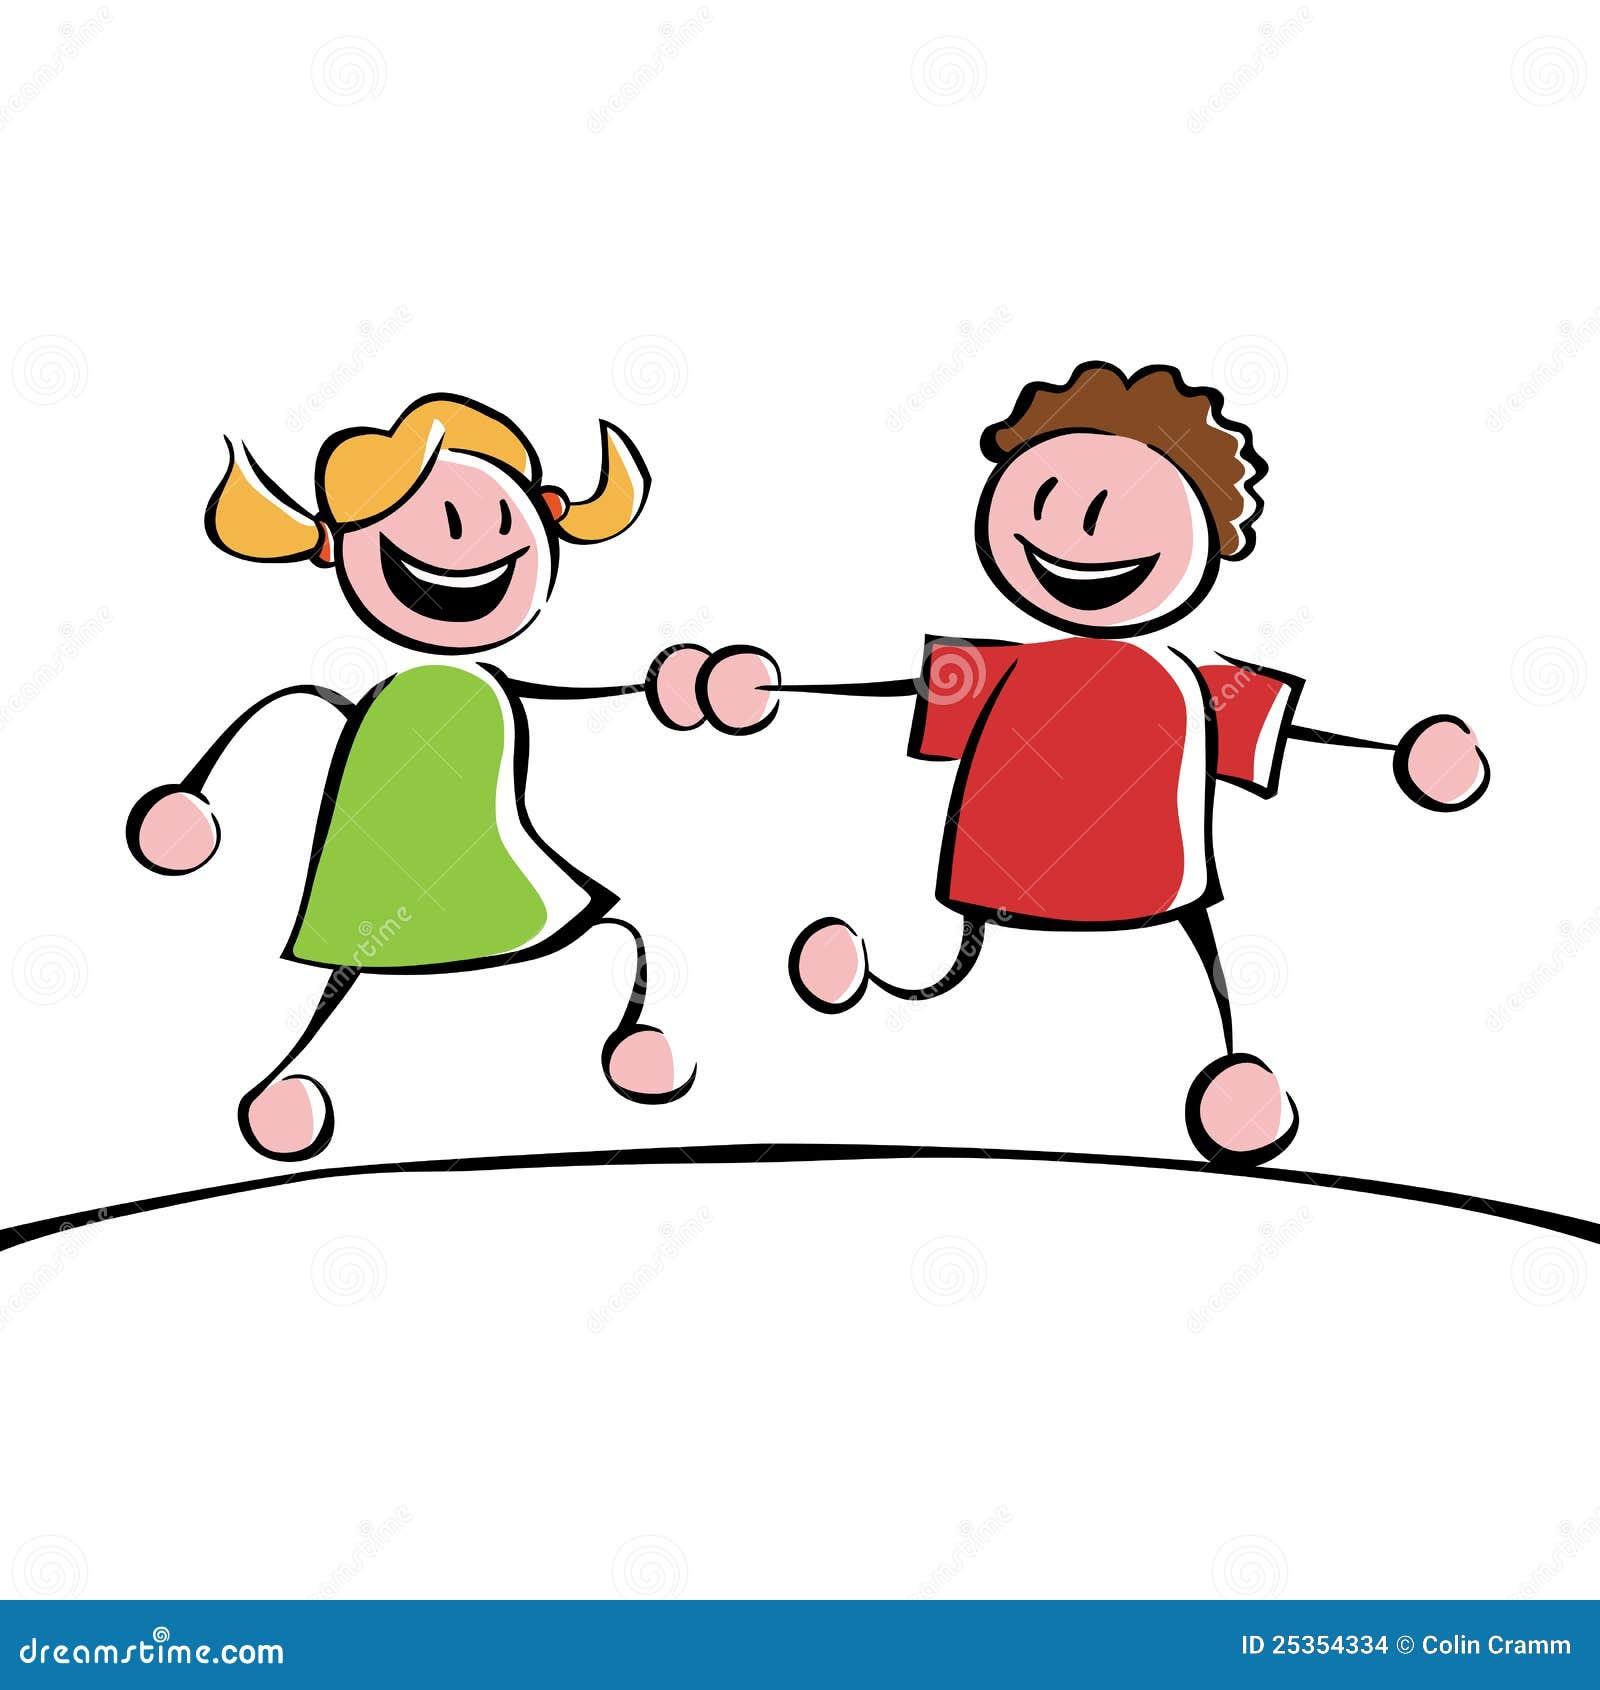 children handshake clipart - photo #6